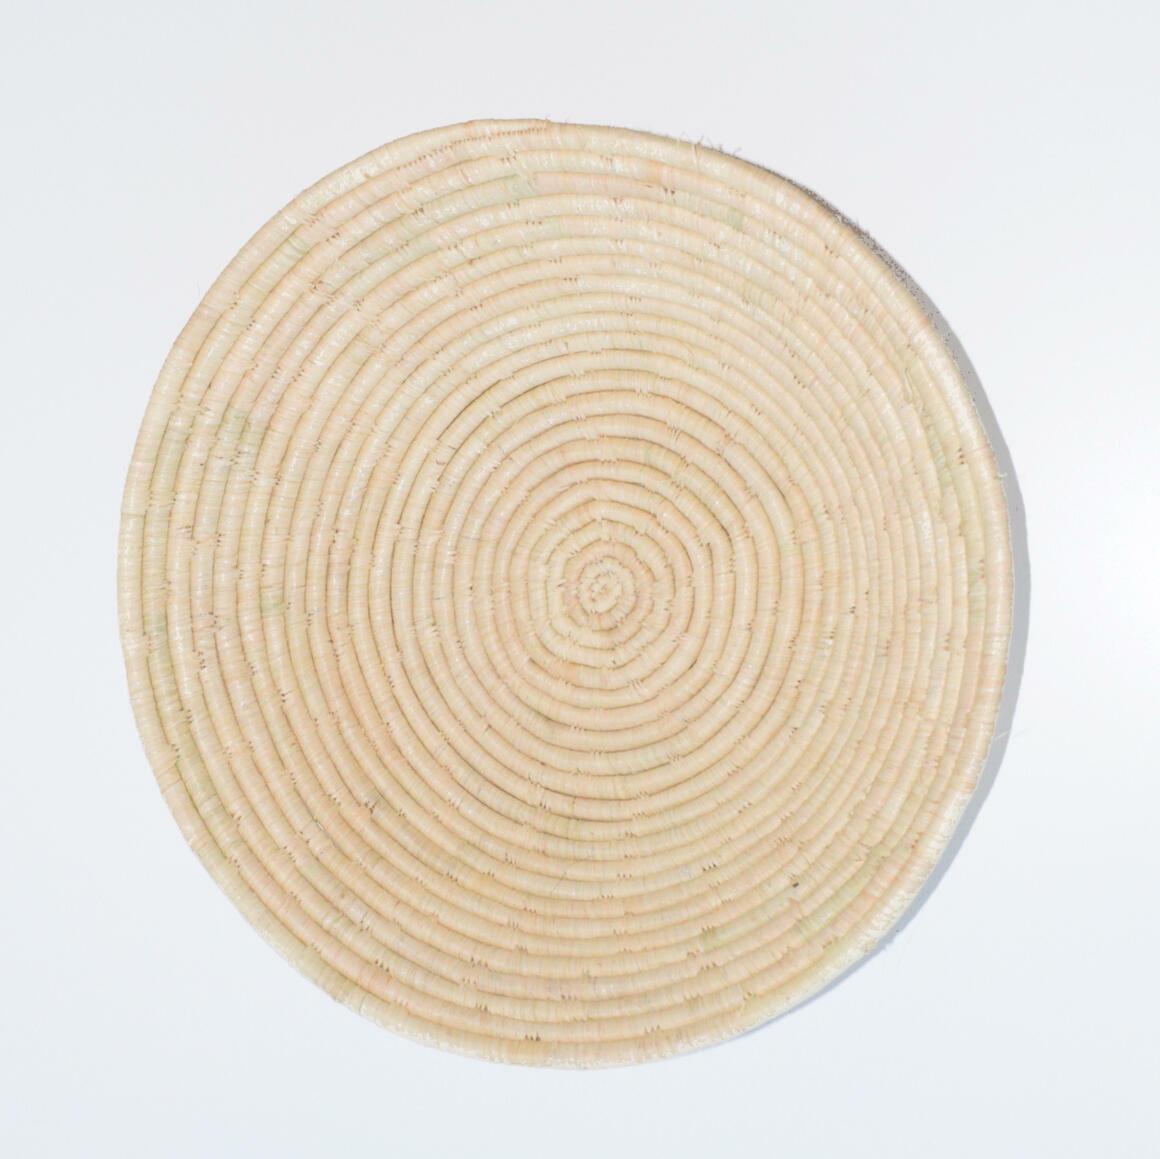 Small 20cm diameter woven bowl - Natural | Trada Marketplace